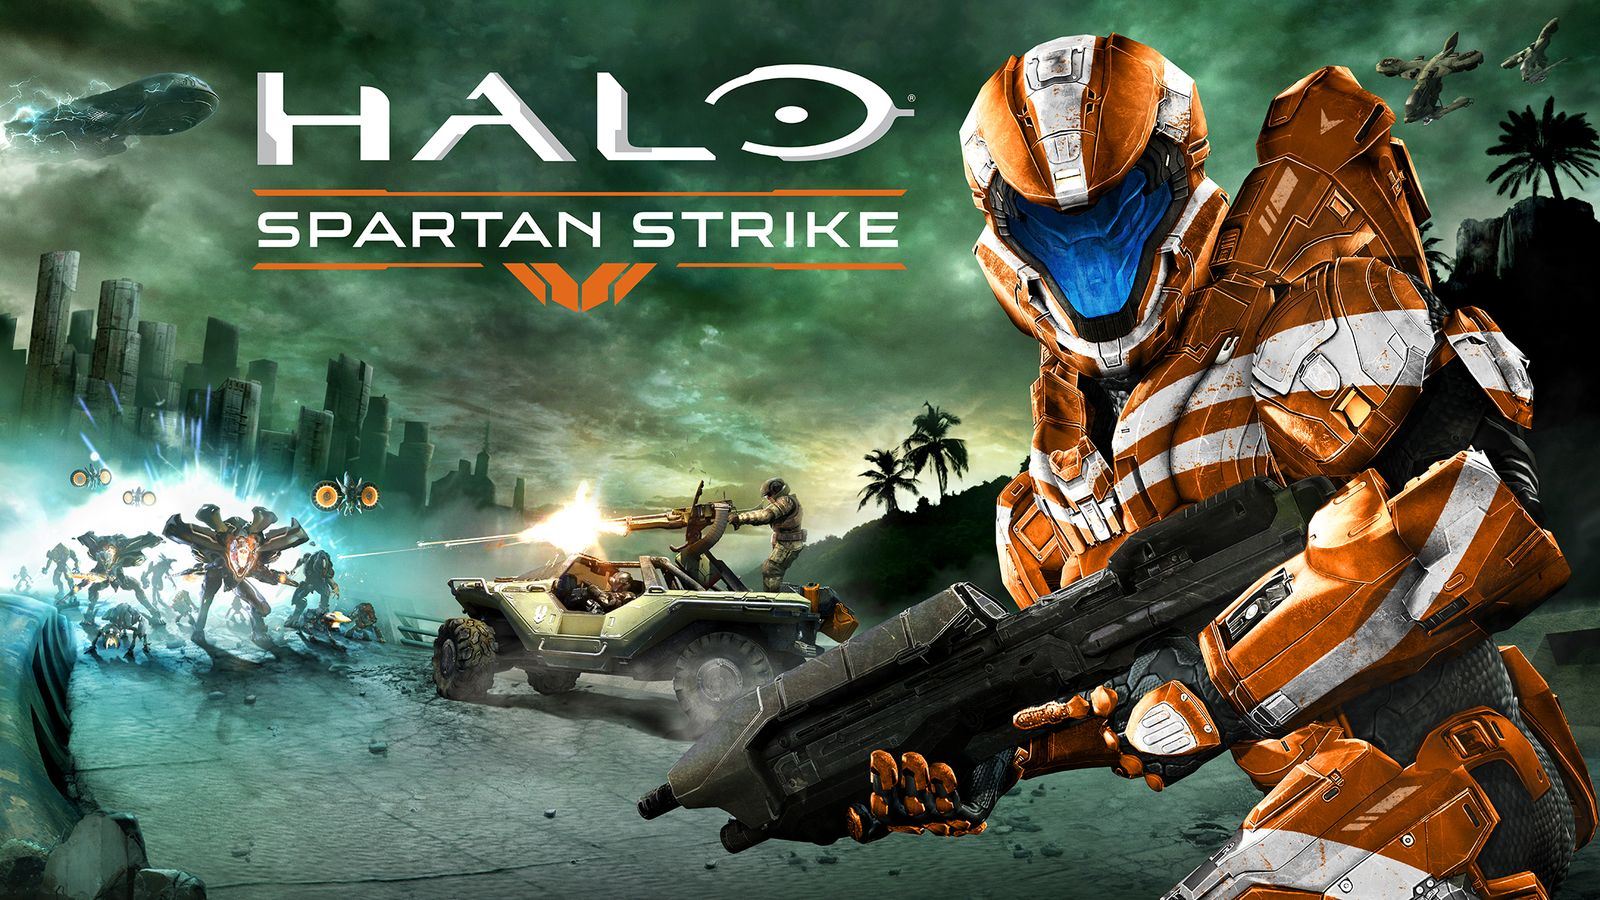 Halo_SpartanStrike_KeyArt_Horizontal_RGB_Final.0.0.jpg